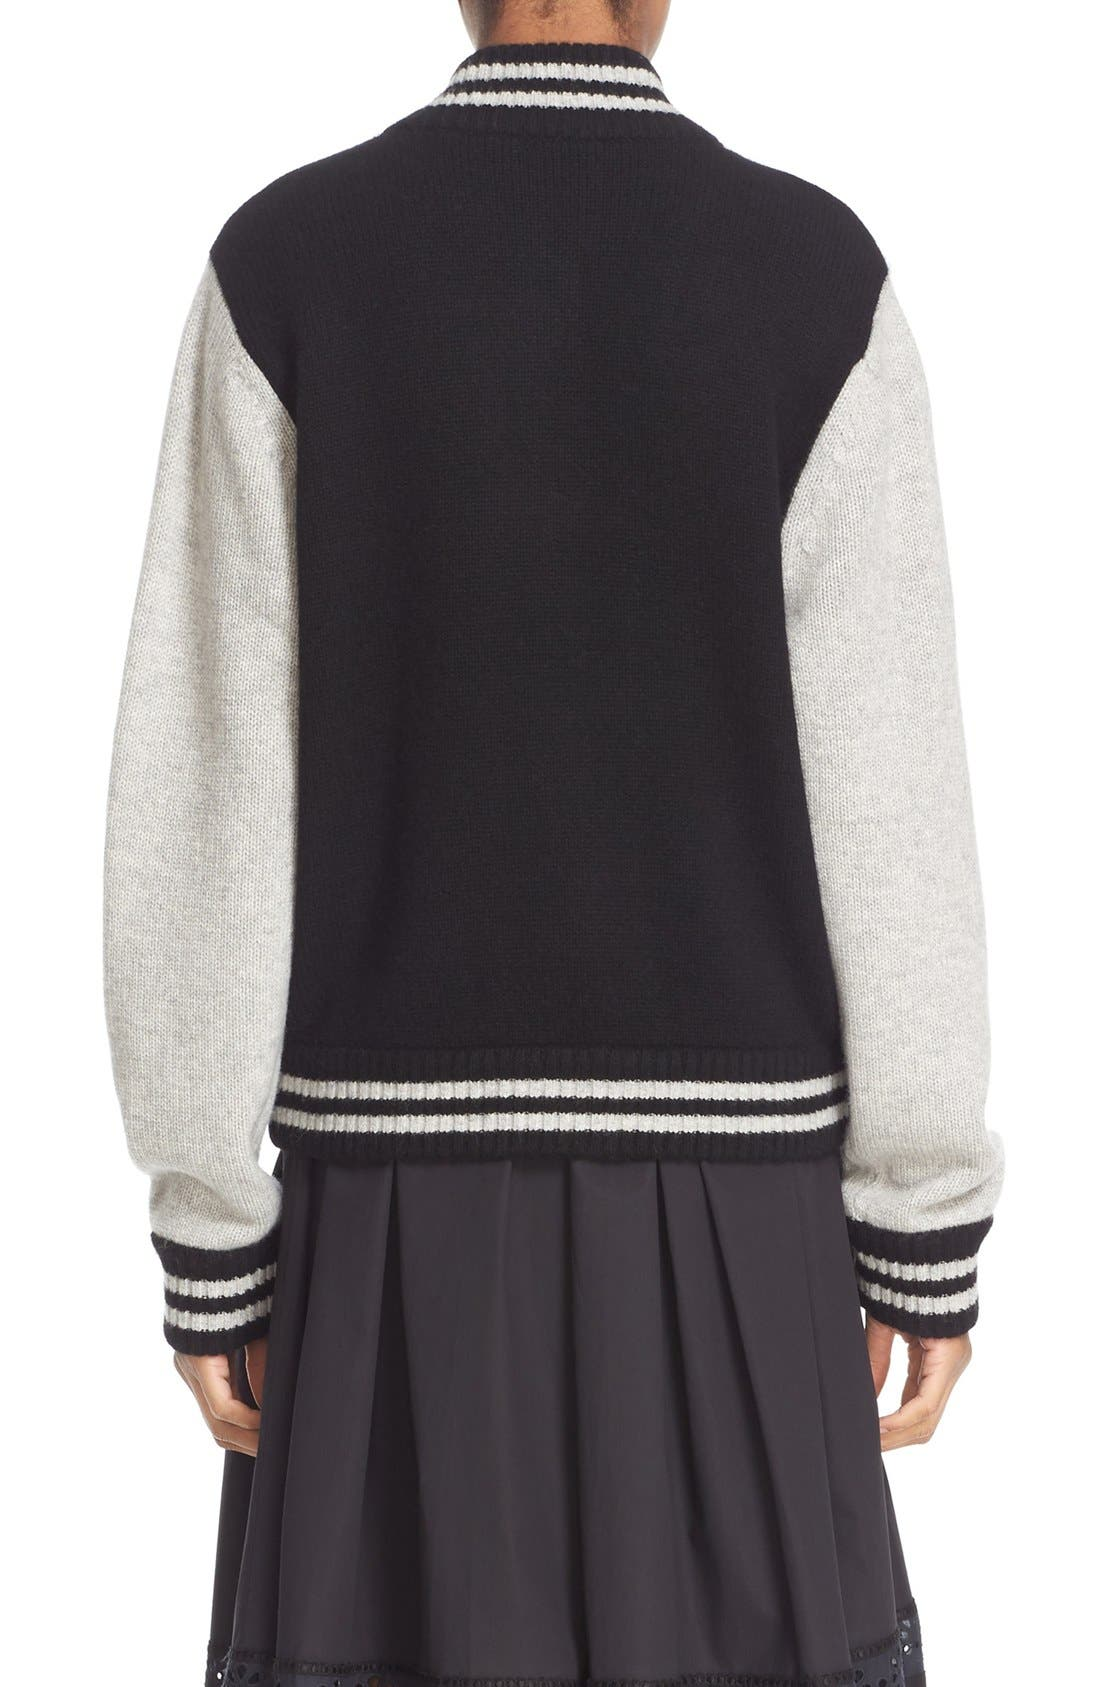 Stripe Detail Wool & Cashmere Knit Varsity Jacket,                             Alternate thumbnail 2, color,                             Black